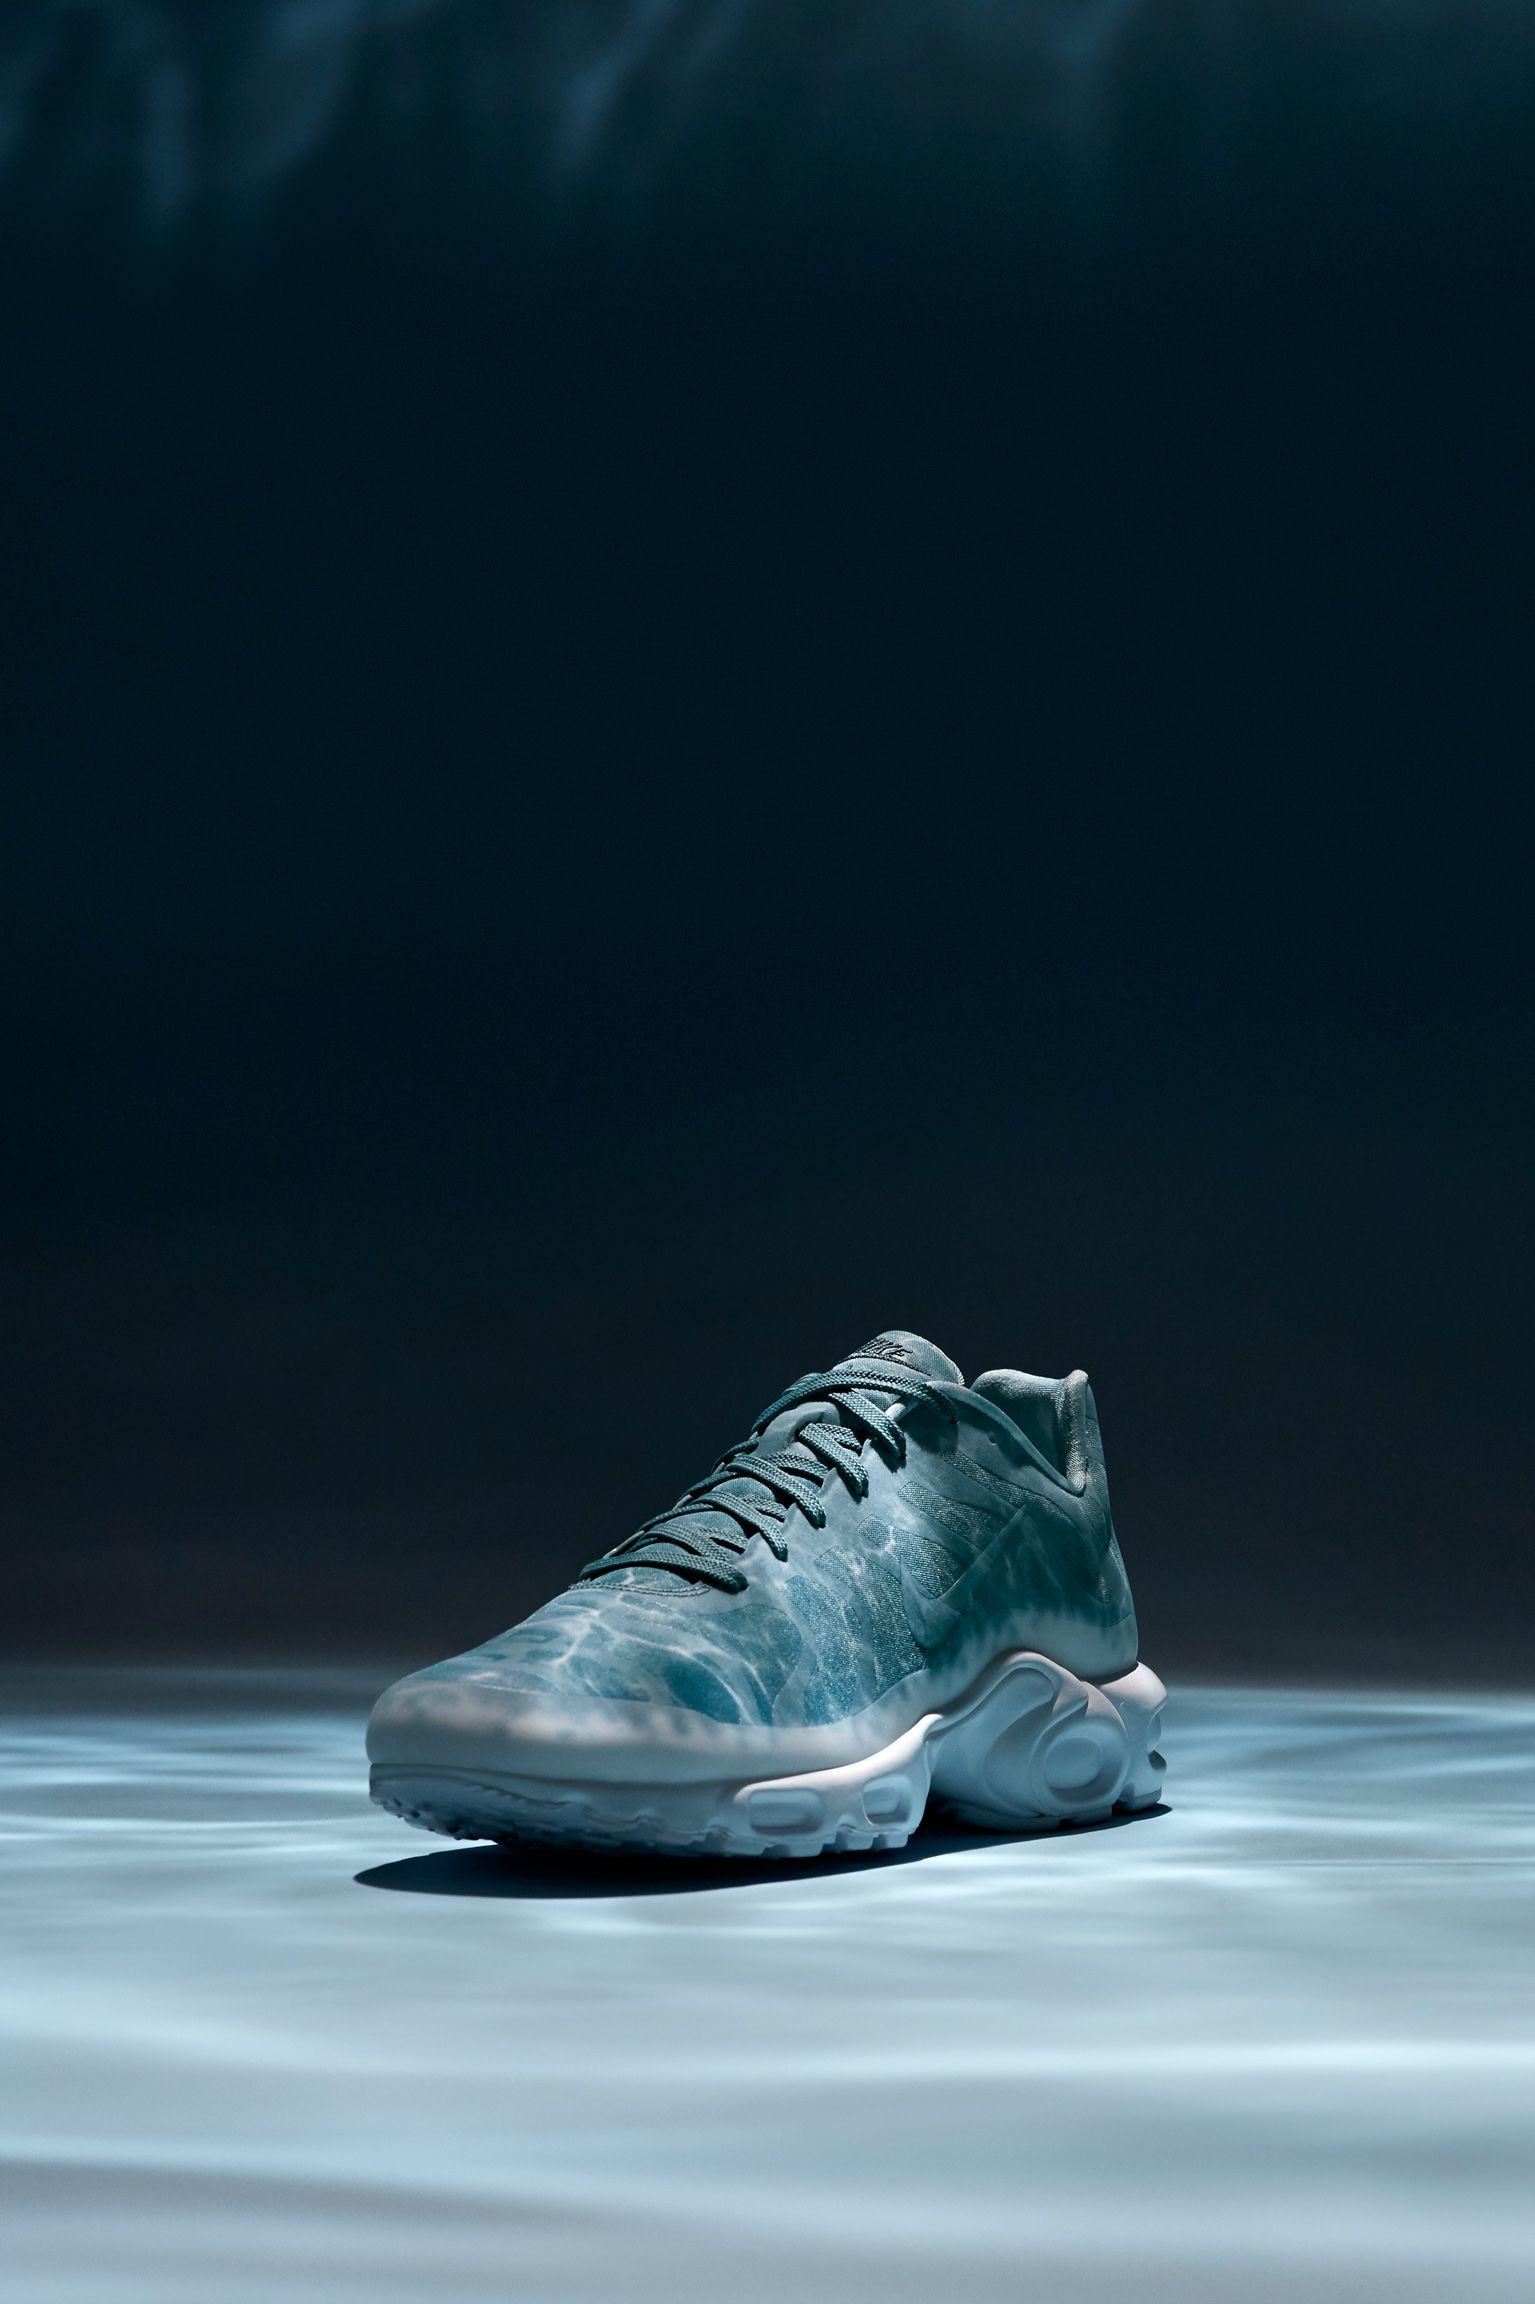 NikeLab Air Max Plus Fuse 'Mineral Teal'